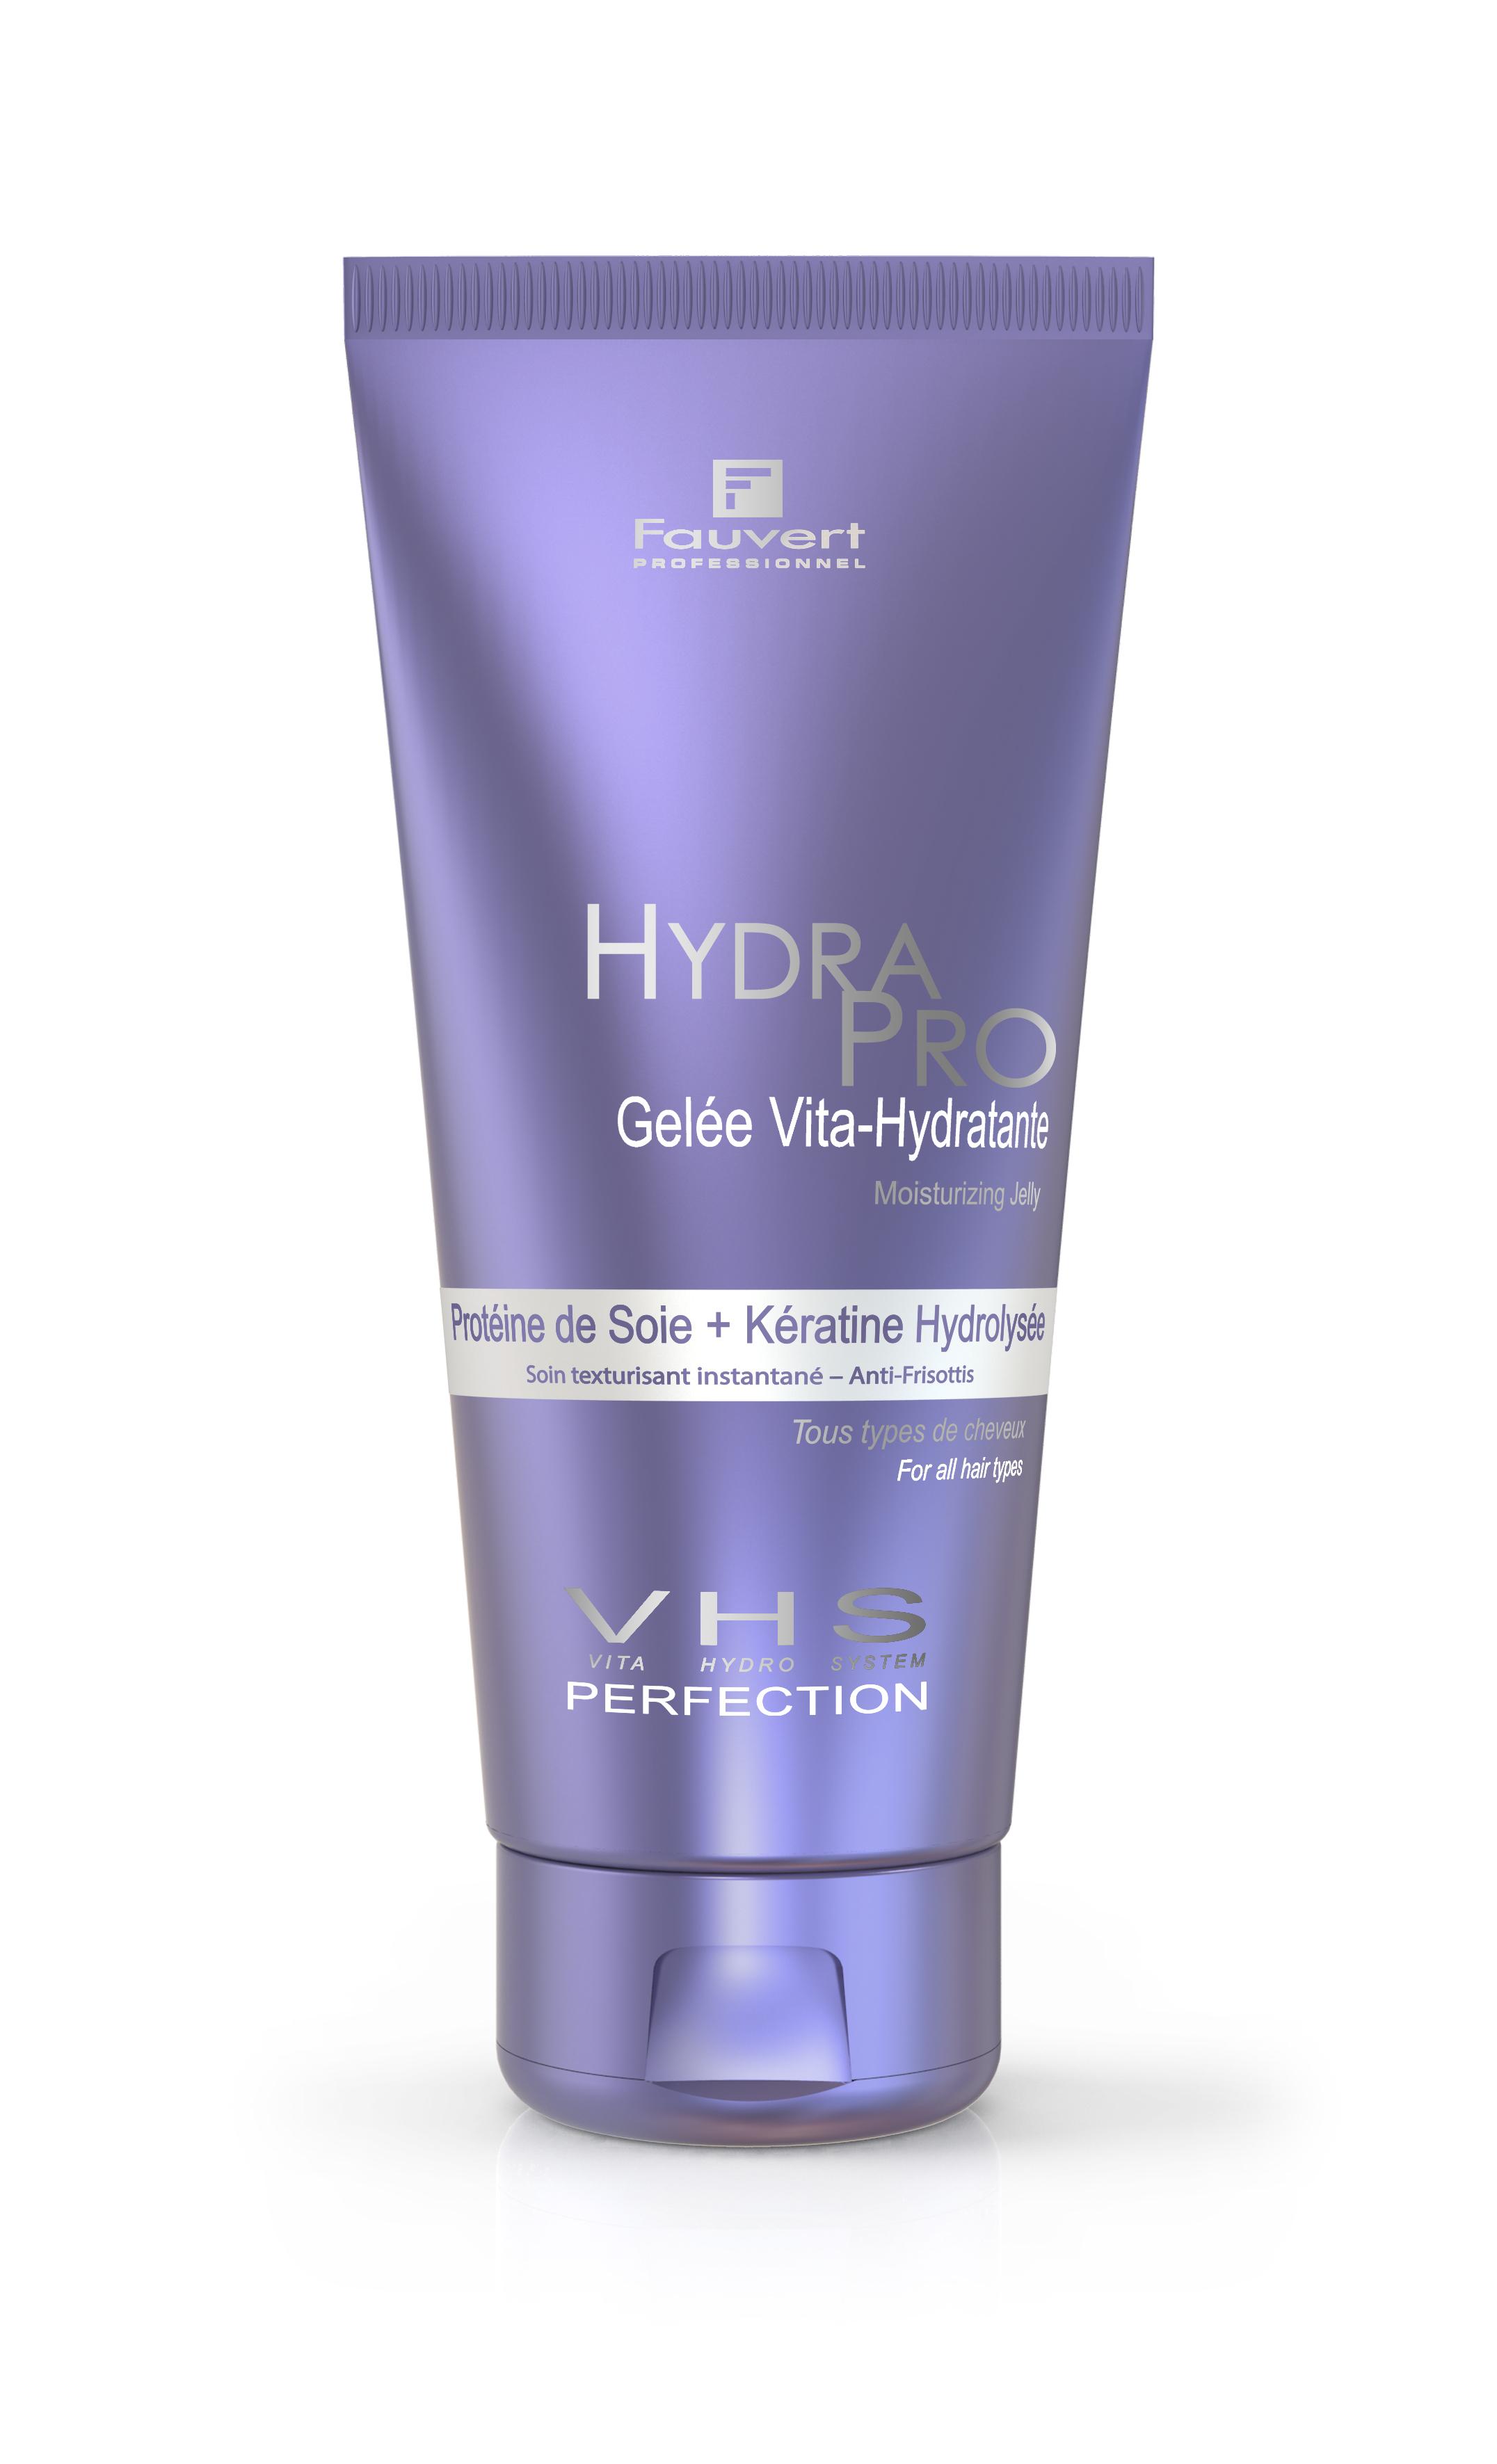 Gelee Vita-Hydratante Aux Extraits D'Aloe Vera - Vita Hydro-System - Hydratation - 200ml